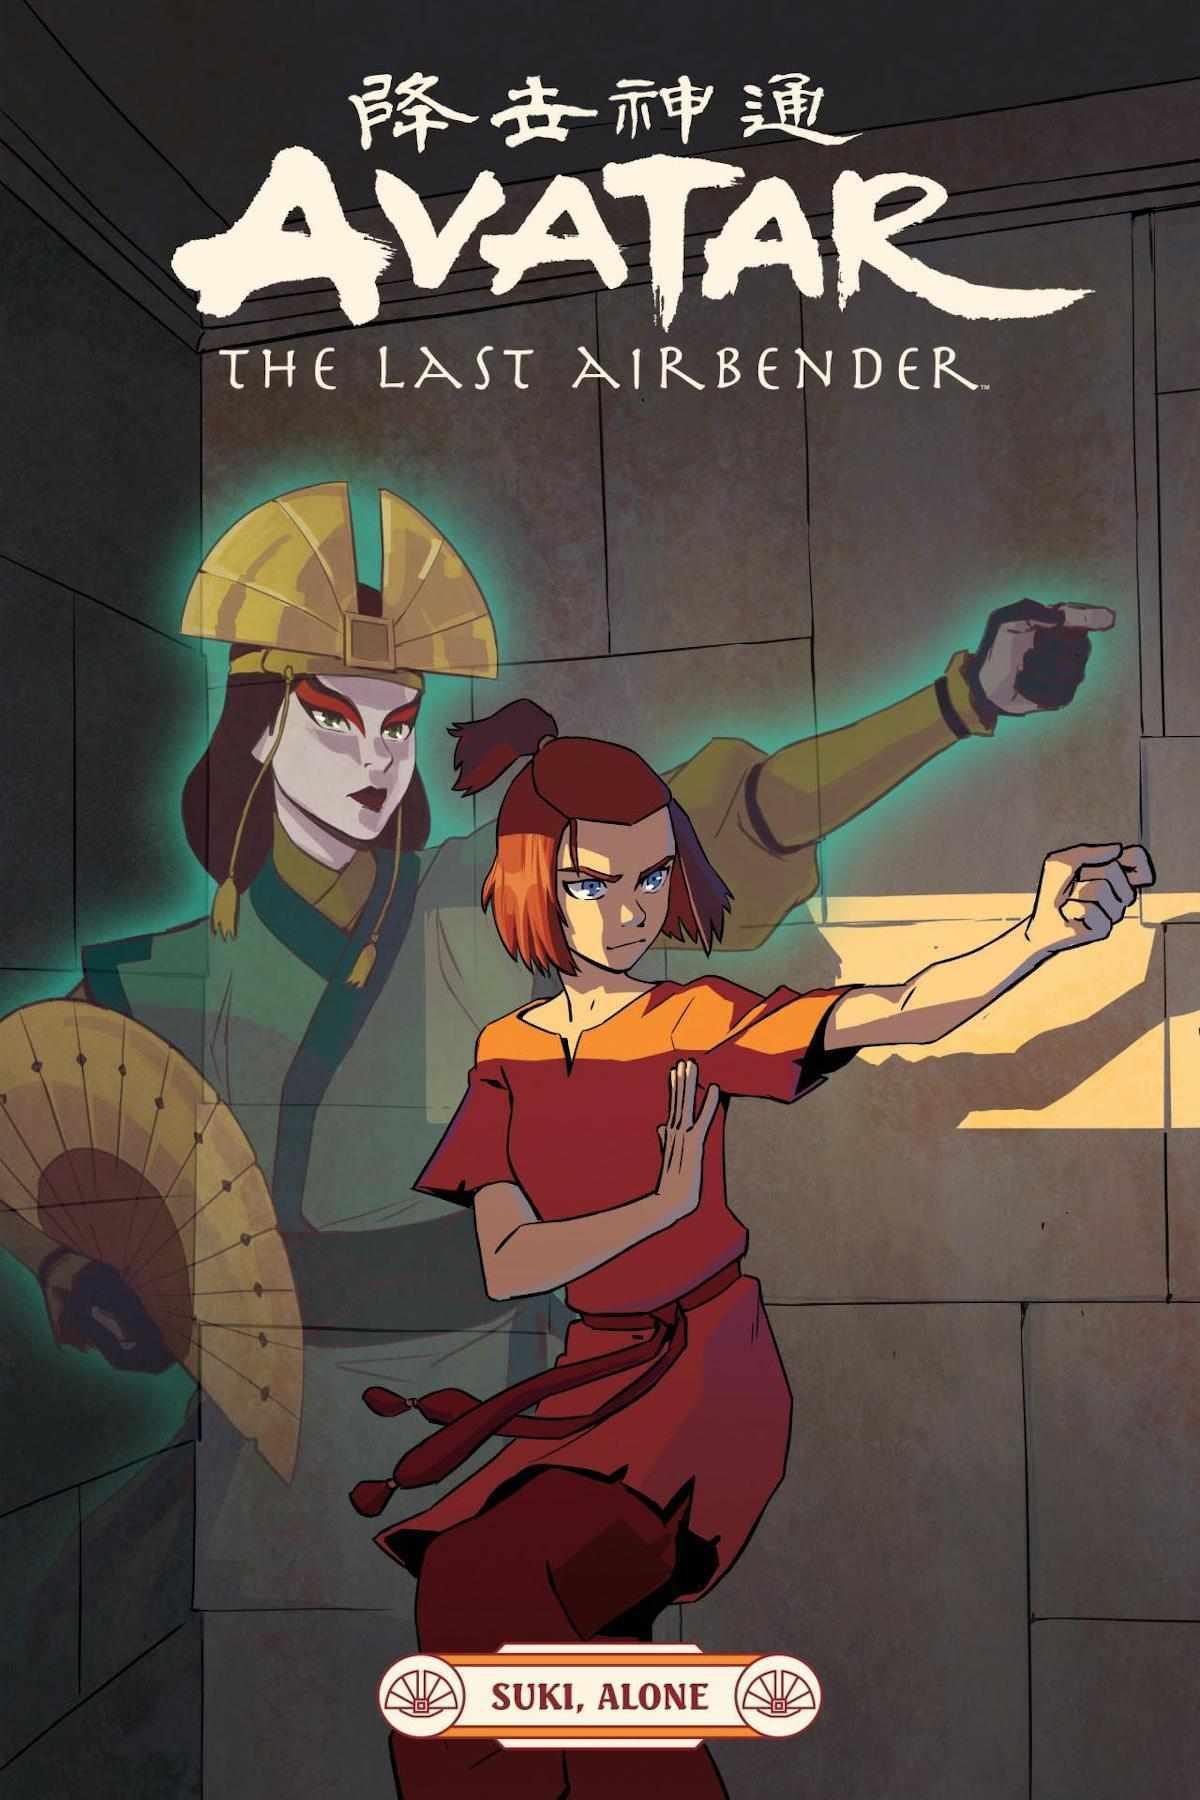 Avatar The Last Airbender Suki Alone OGN